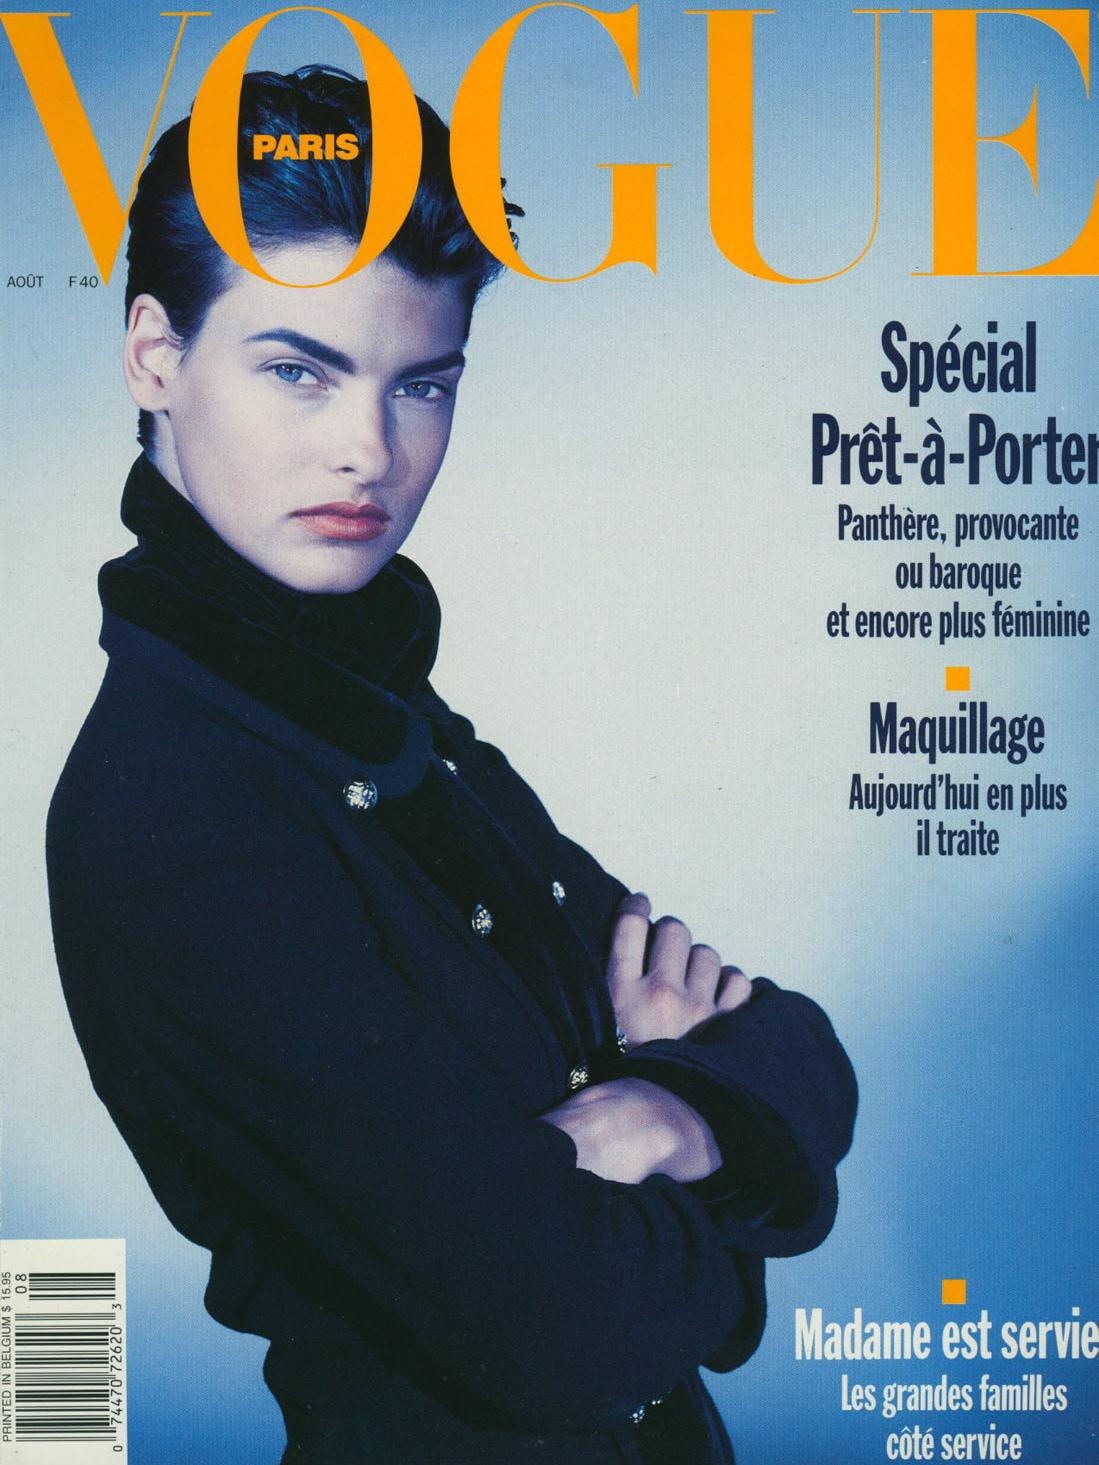 Vogue (Paris) August 1989 | Linda Evangelista